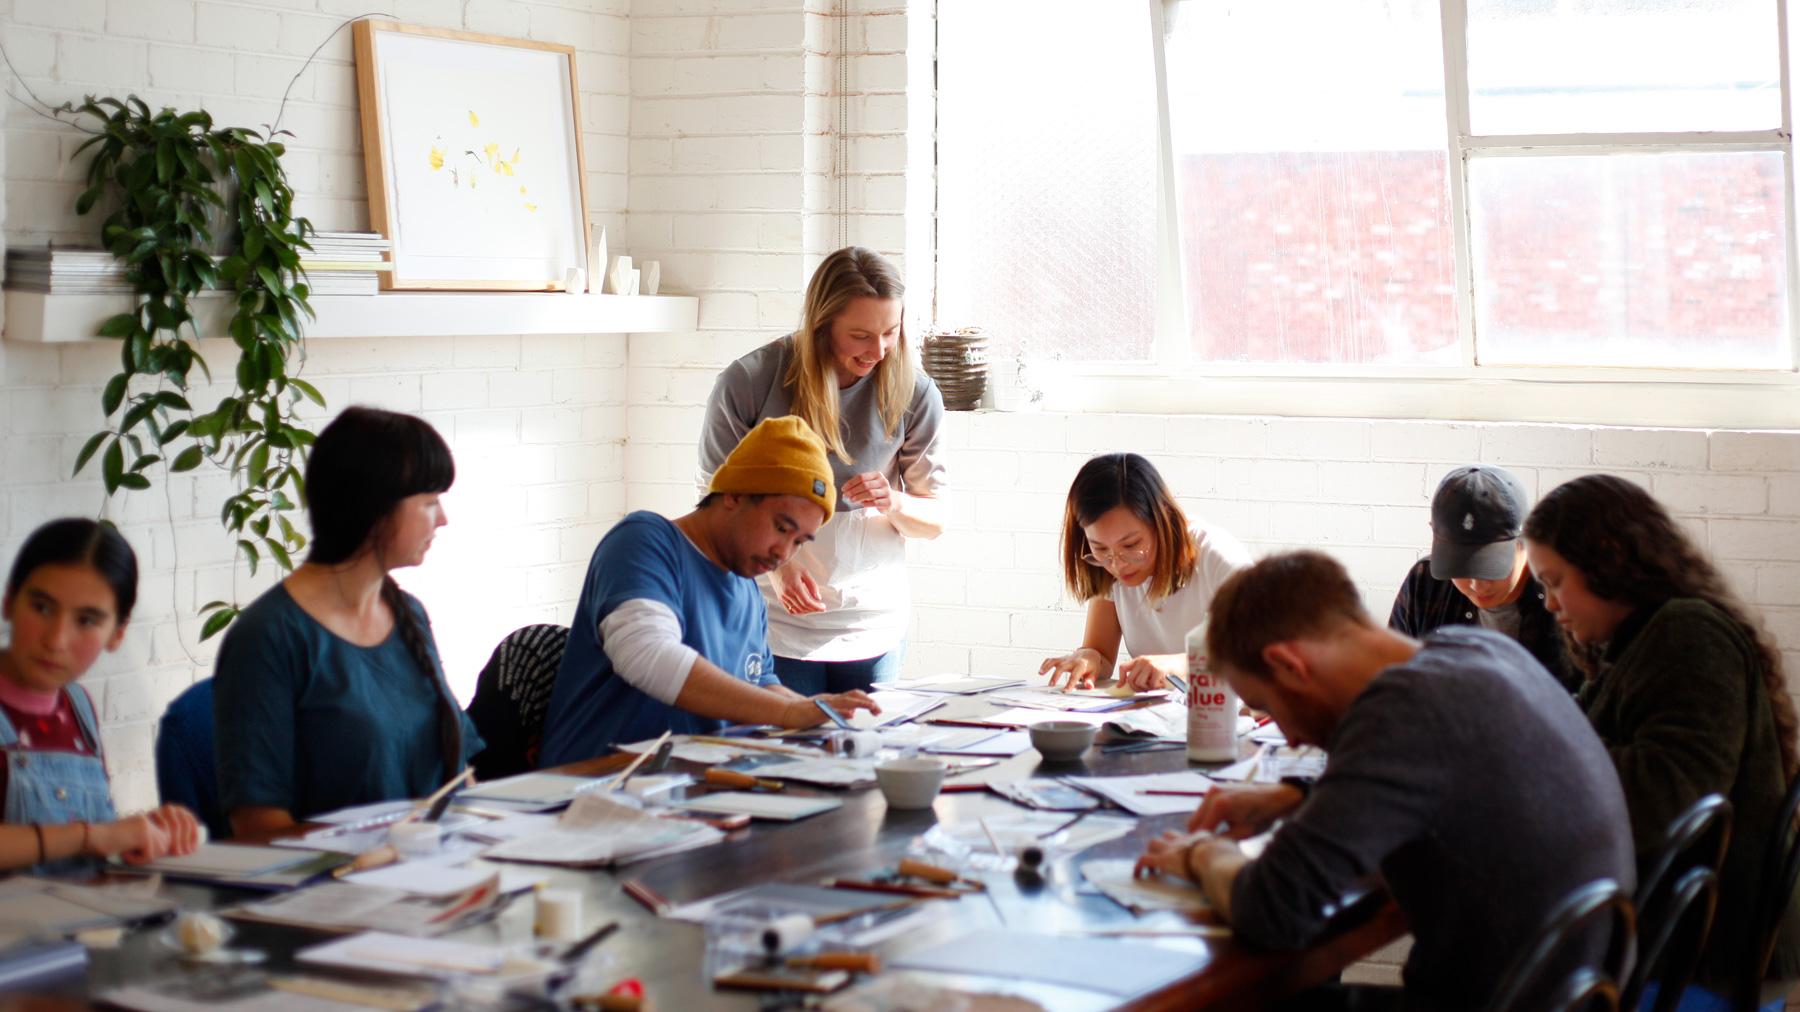 SeventhandTwo-Kelly-Gilchrist-Bookbinding-Workshop.jpg